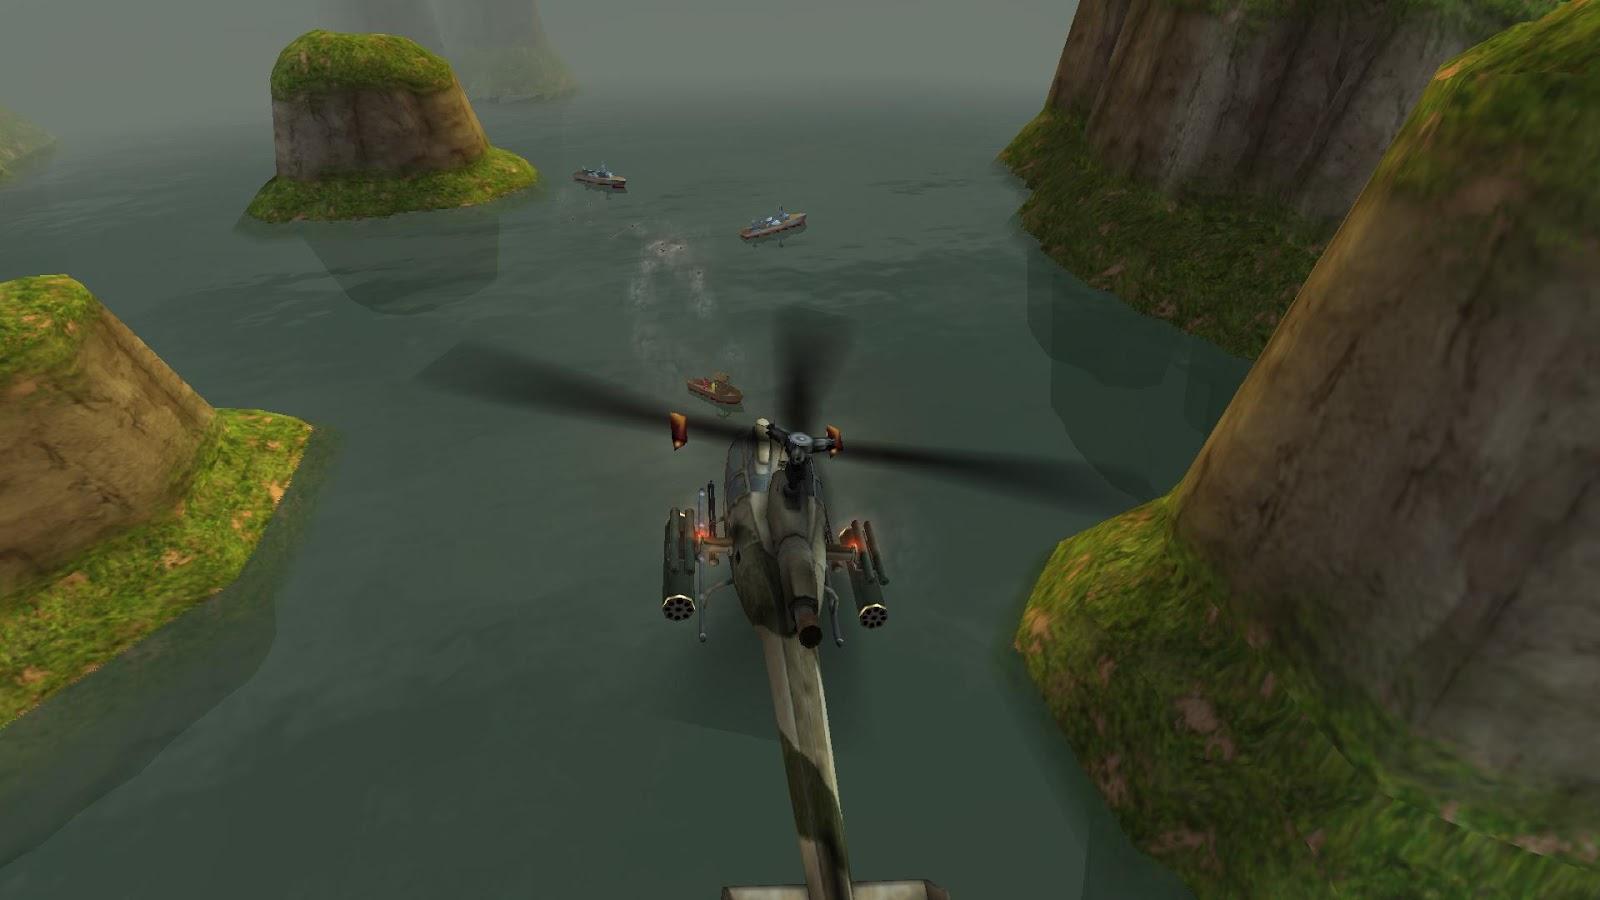 GUNSHIP BATTLE : Helicopter 3D Resimler